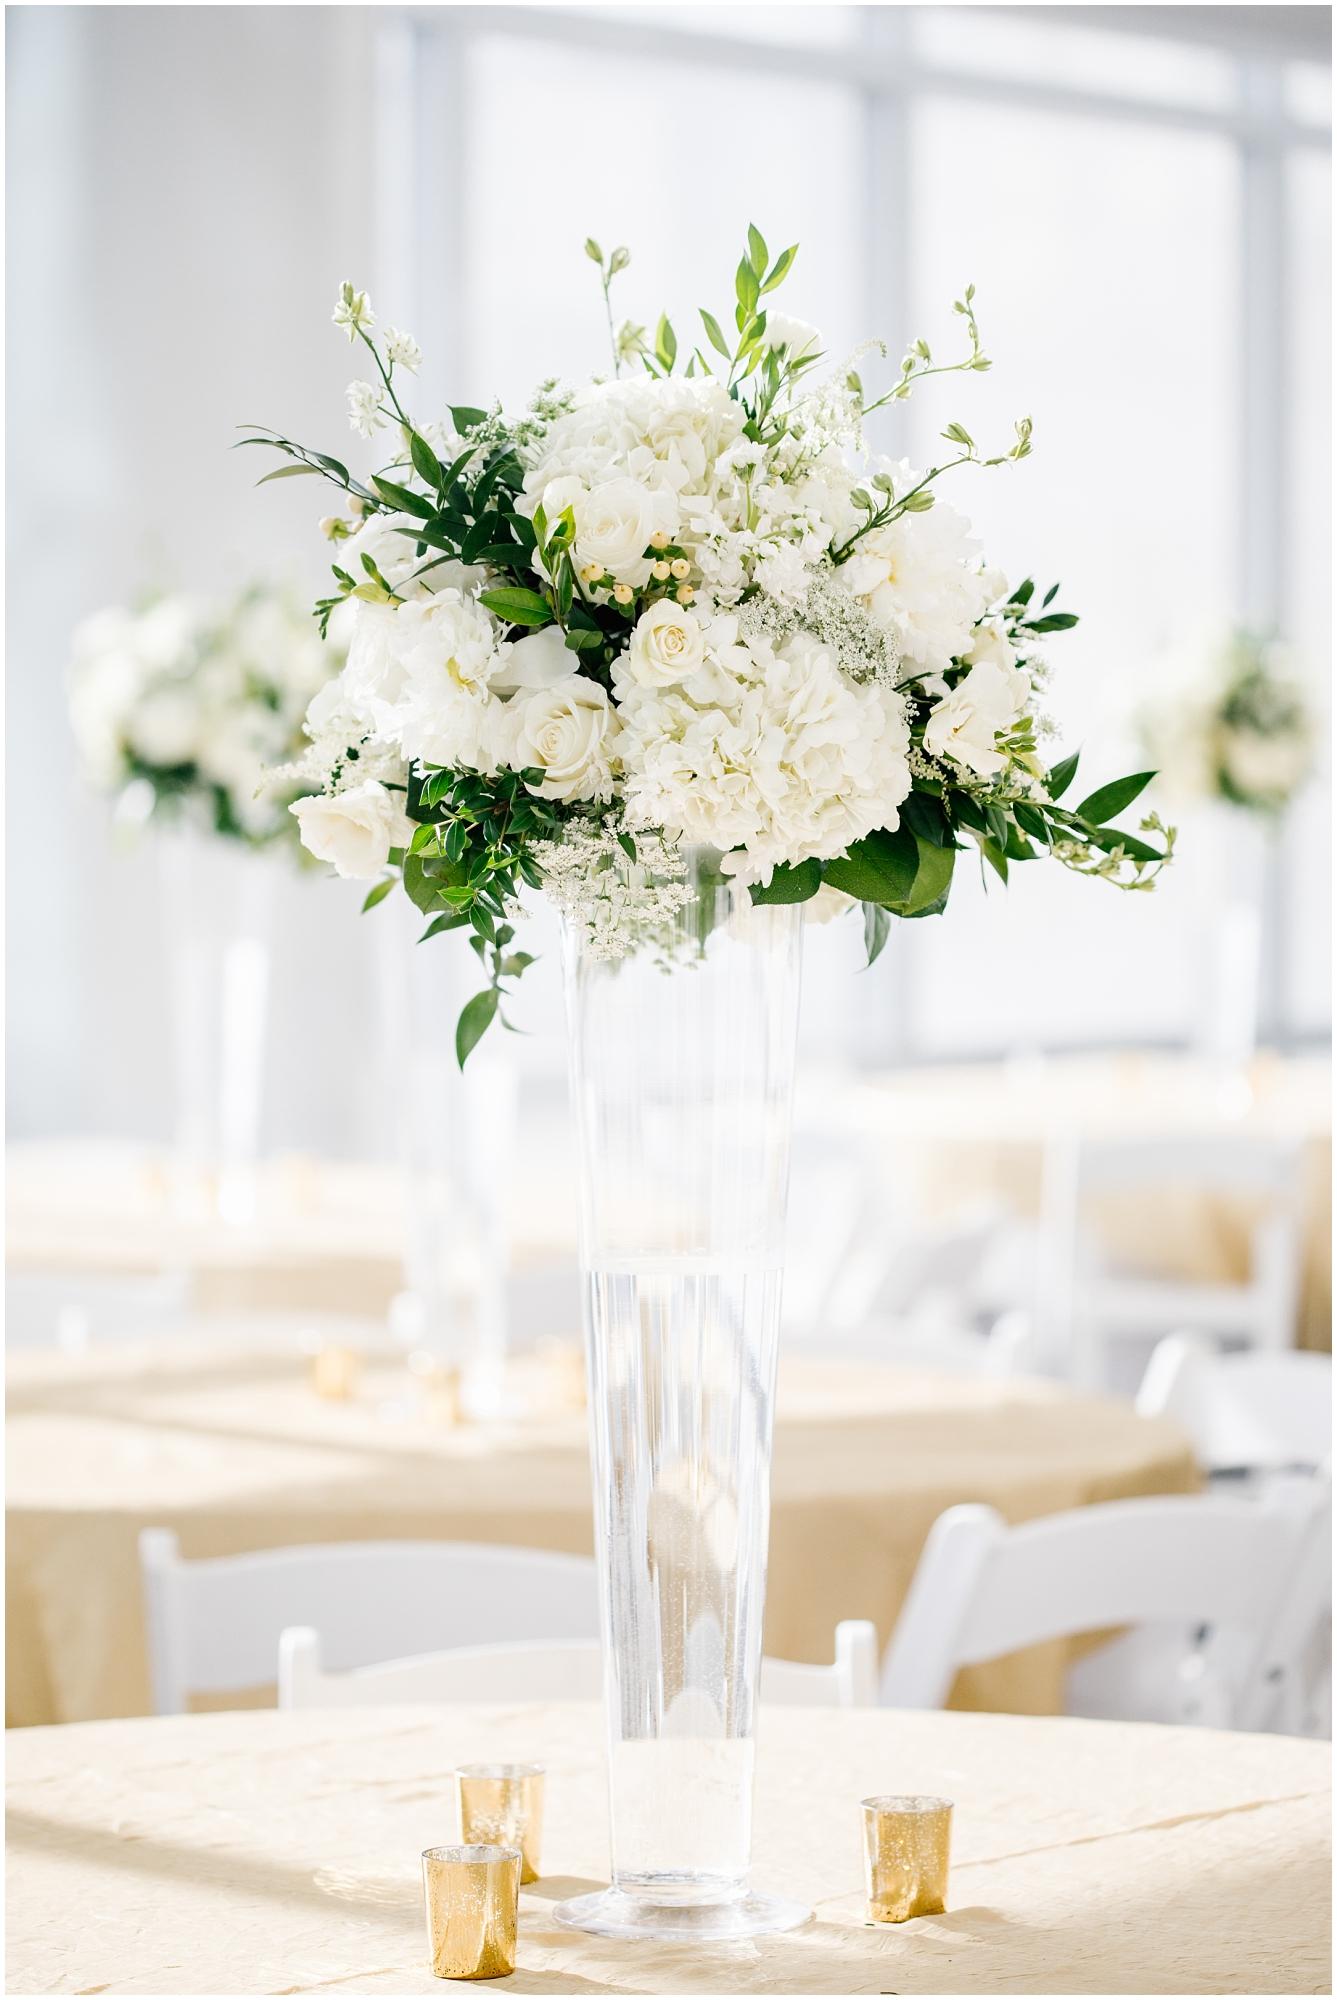 CherylandTyler-335_Lizzie-B-Imagery-Utah-Wedding-Photographer-Park-City-Salt-Lake-City-Temple-Wells-Fargo-Building.jpg